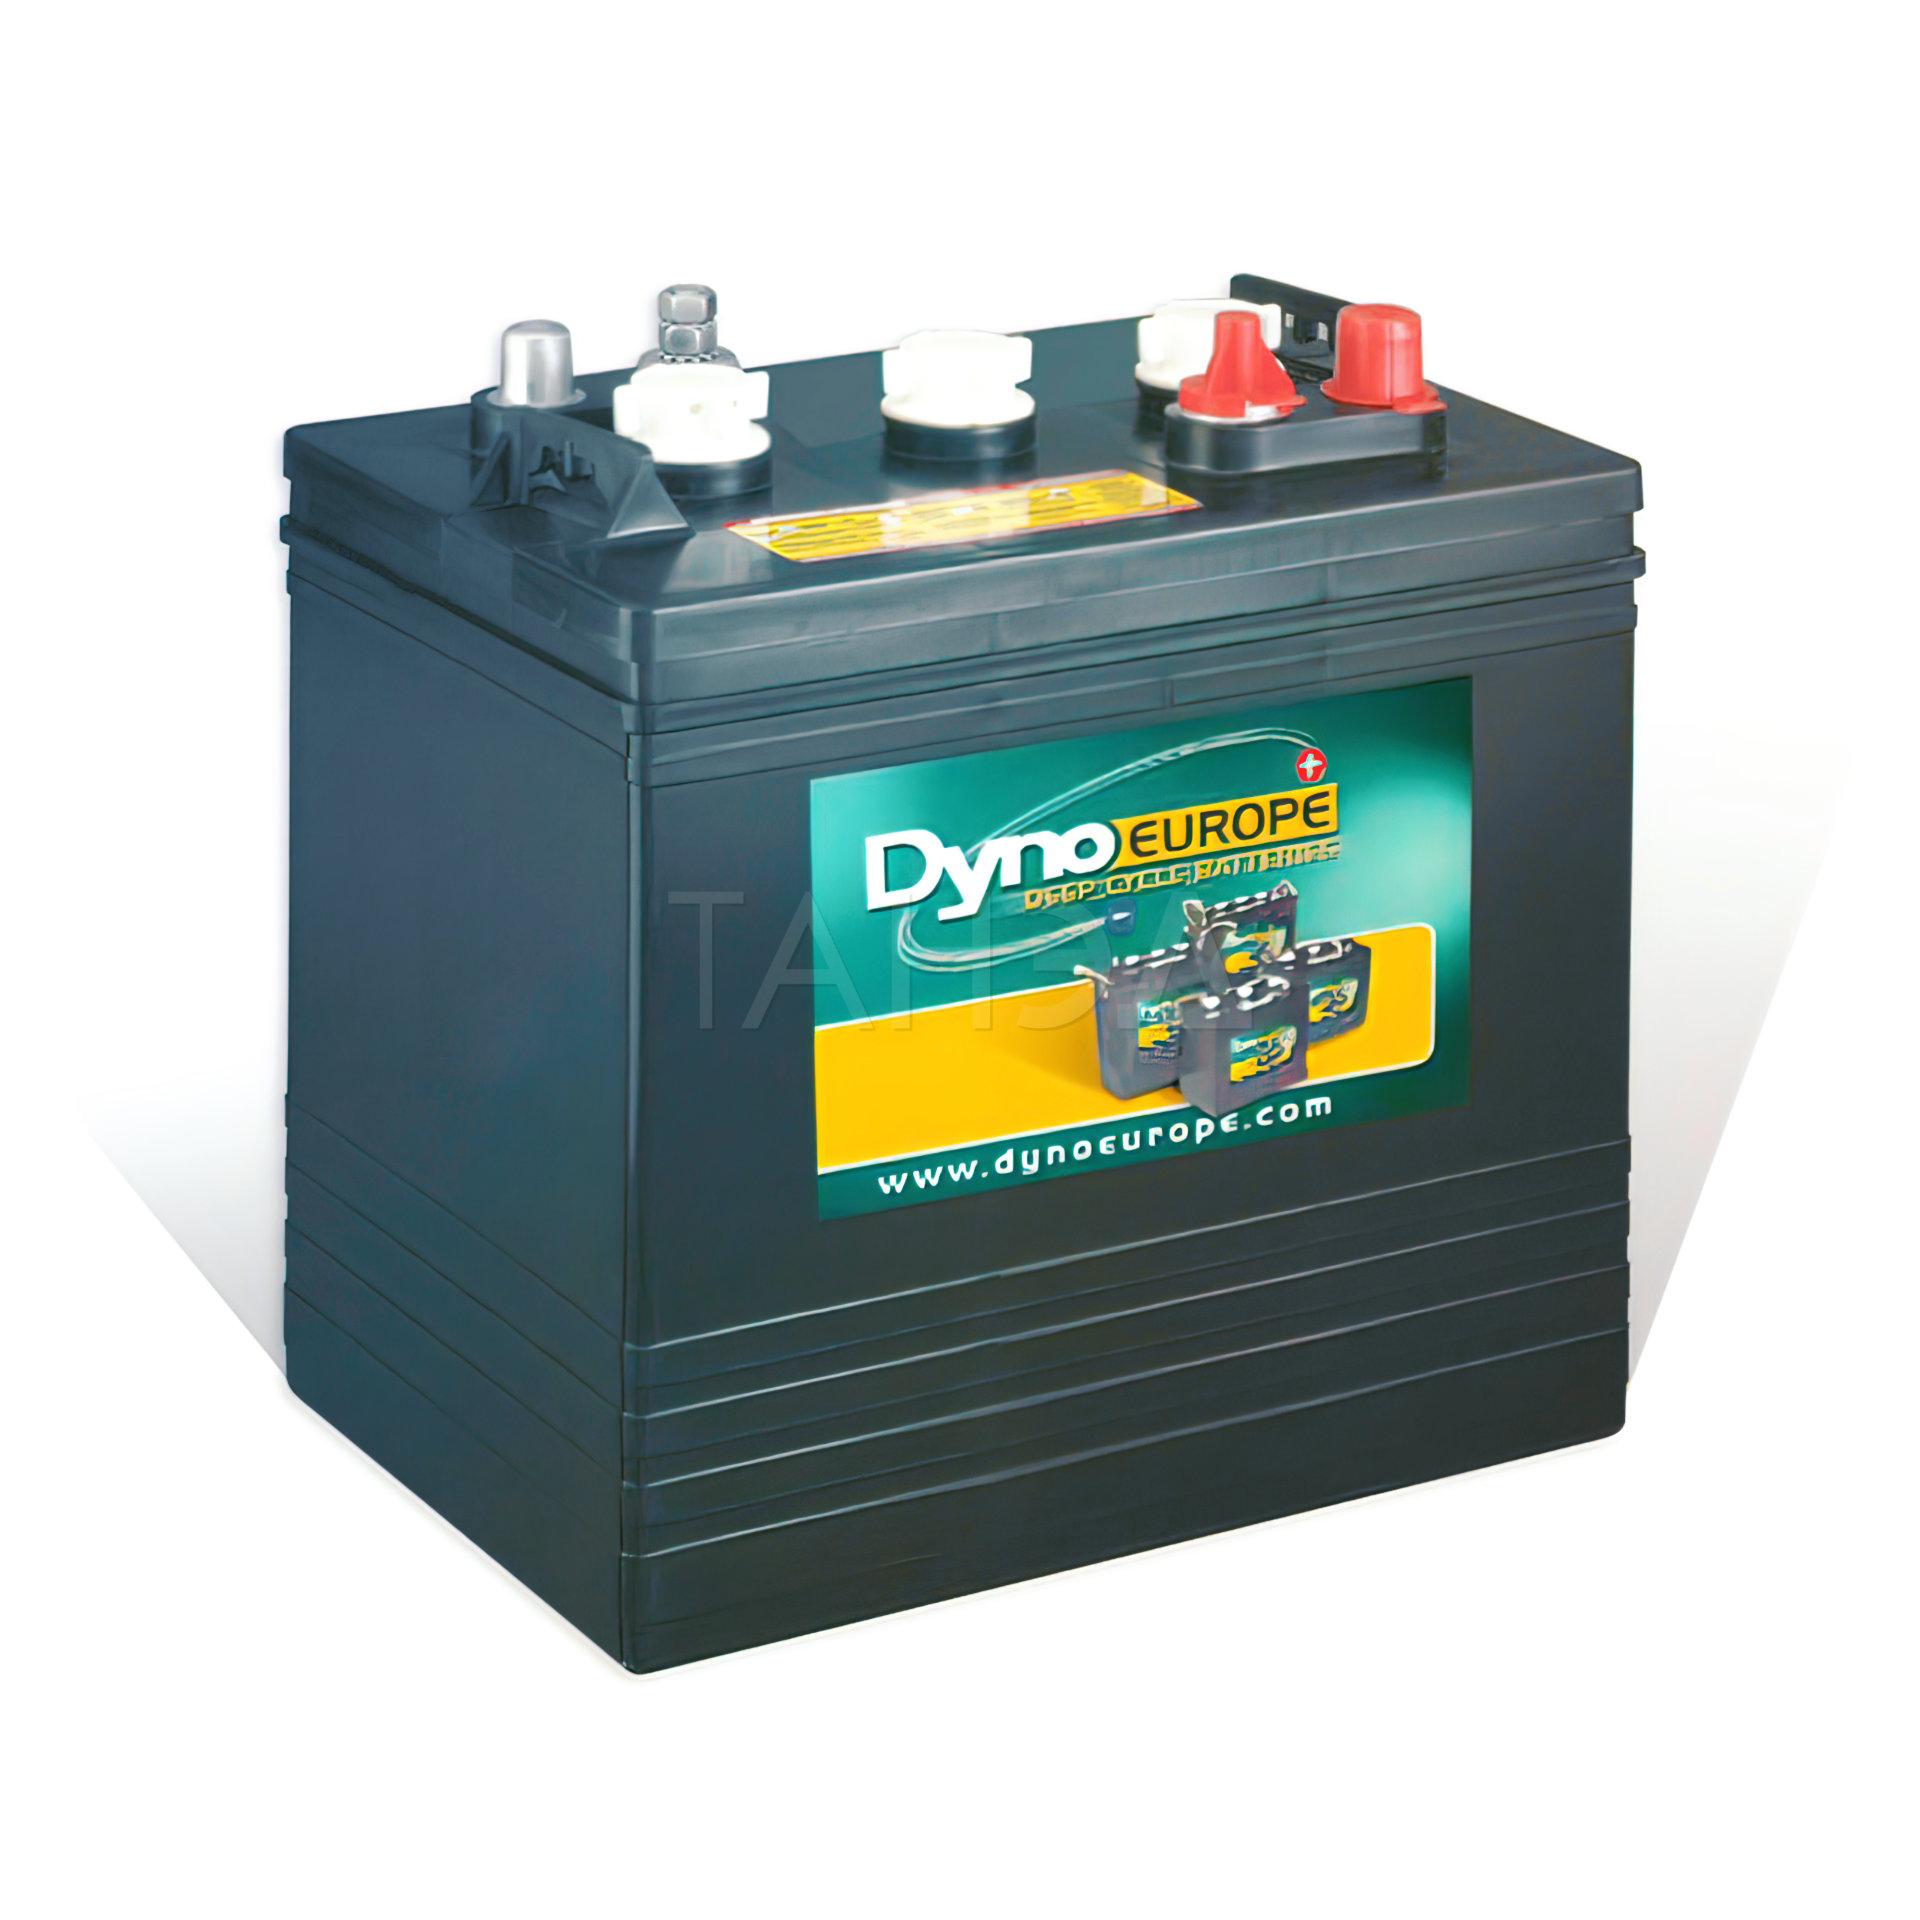 Тяговый аккумулятор GC2C-HD